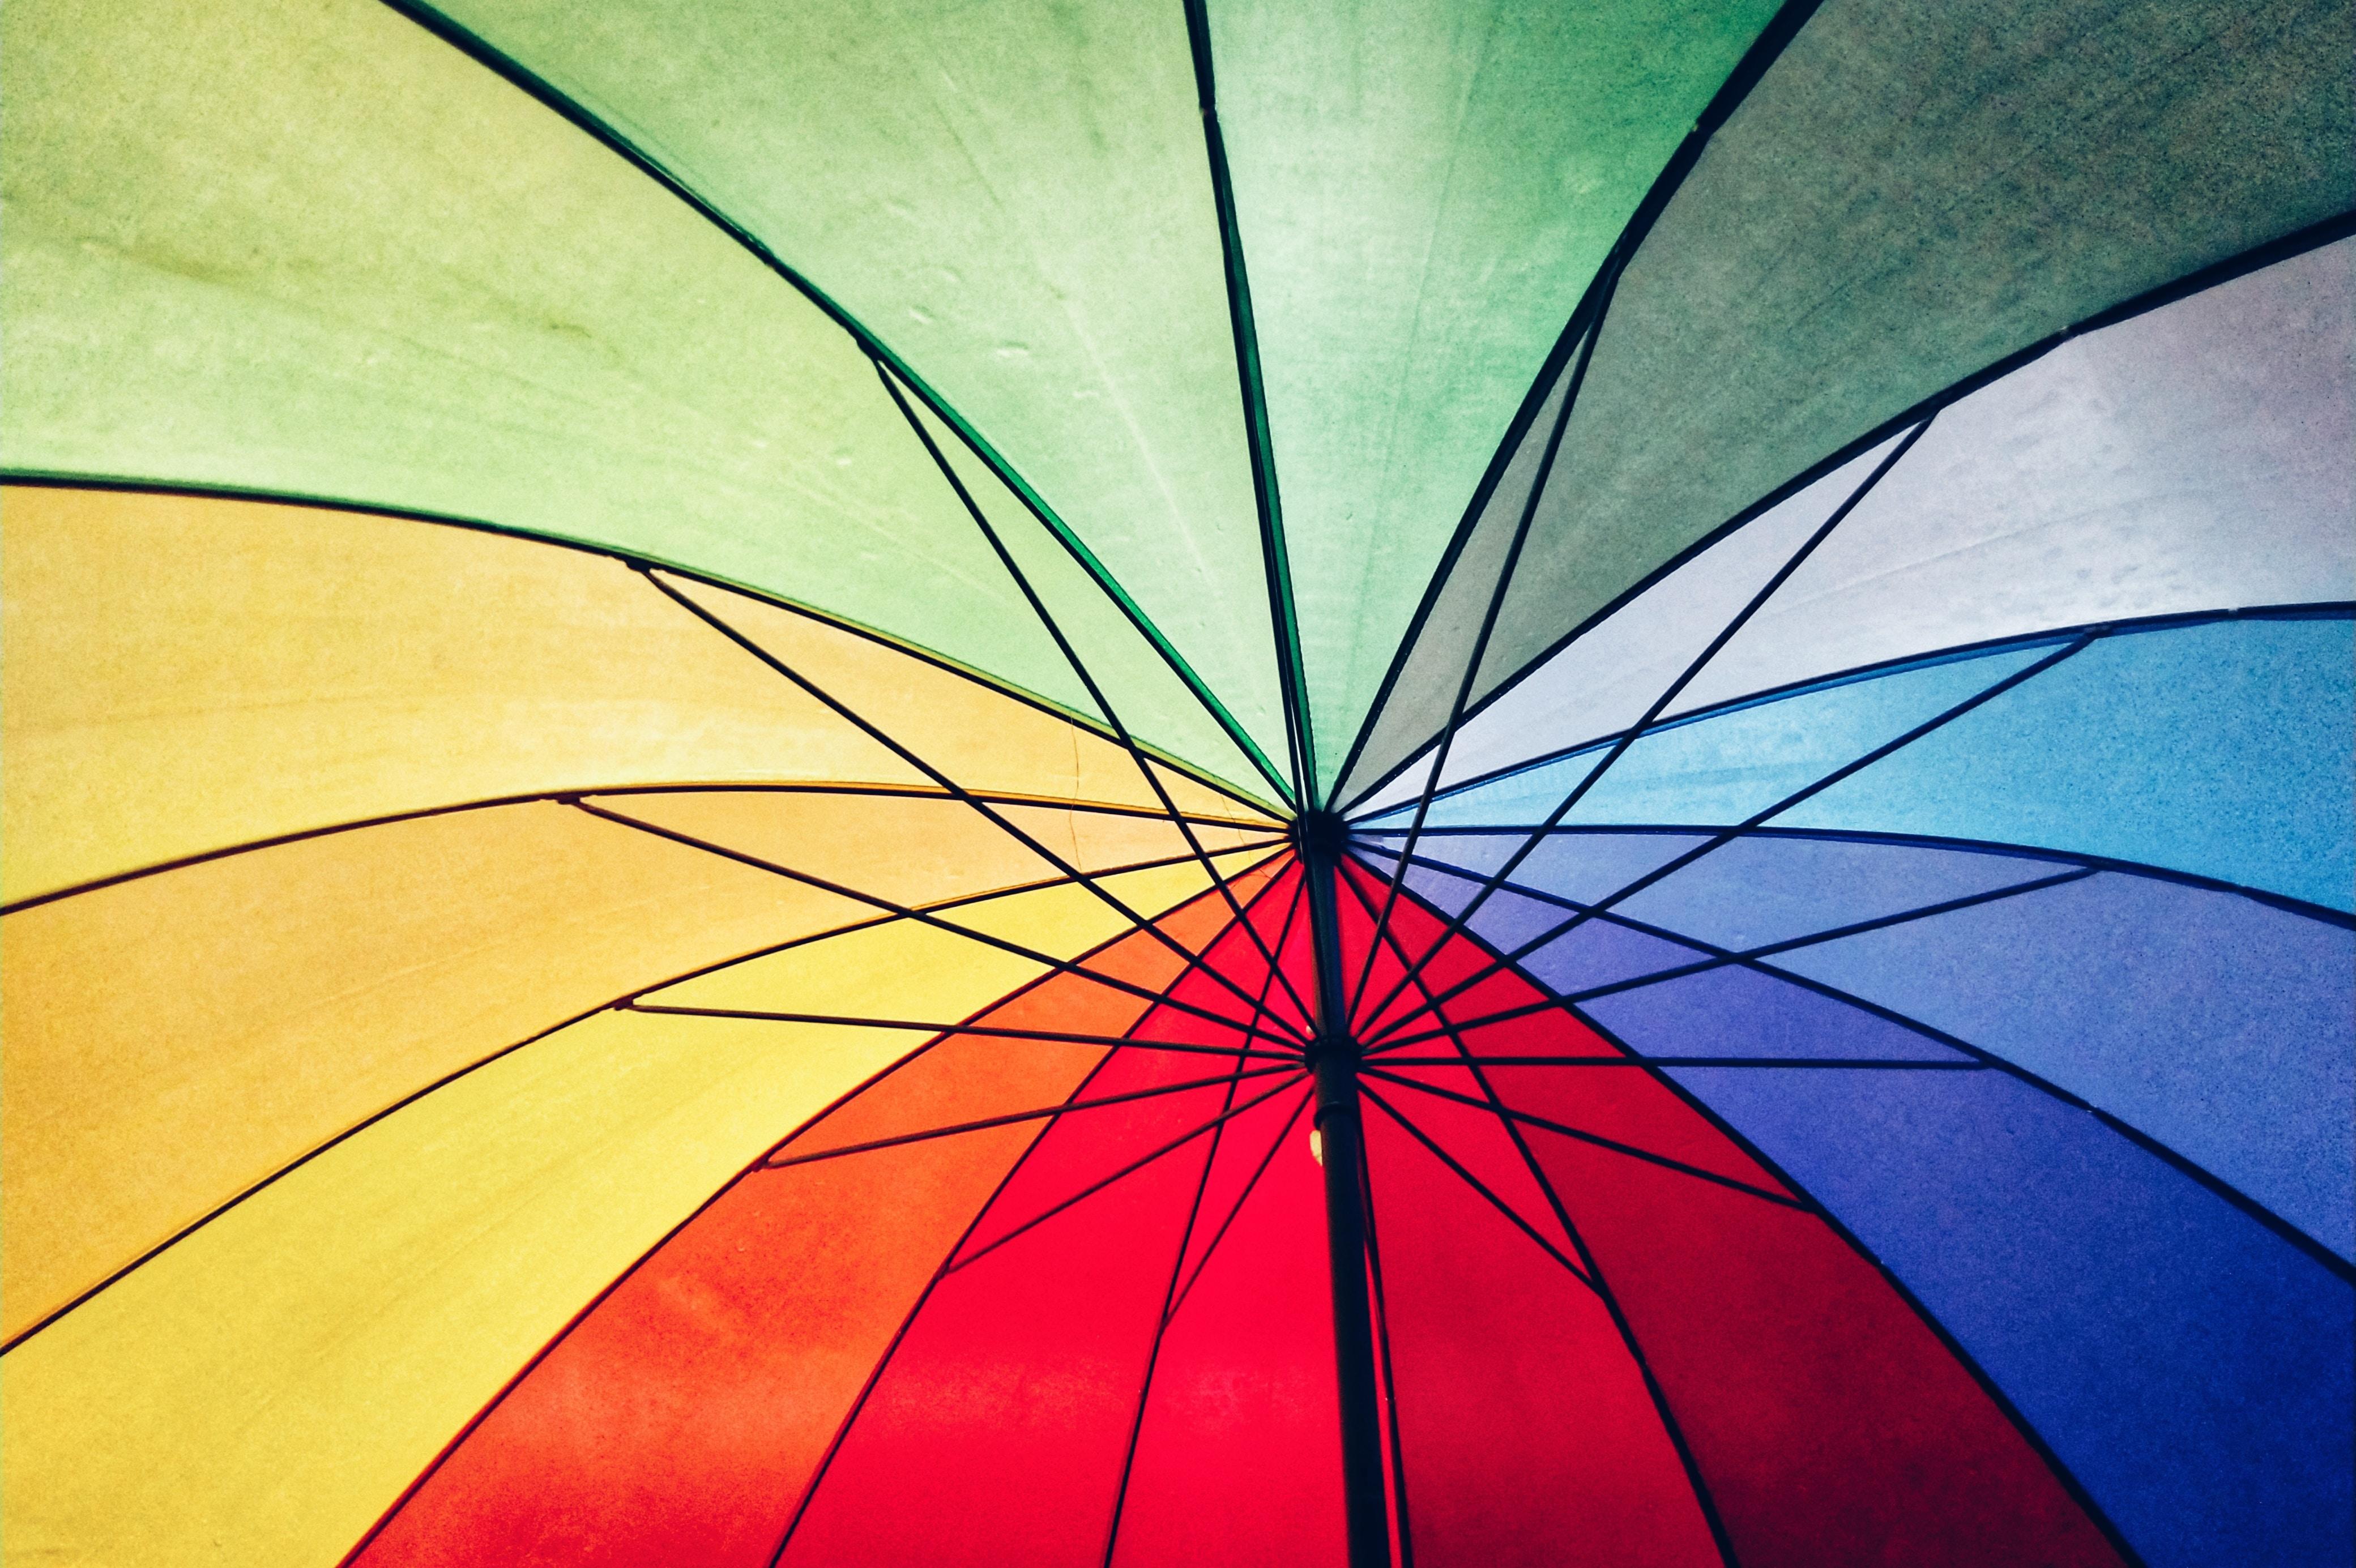 close-up of multicolored umbrella